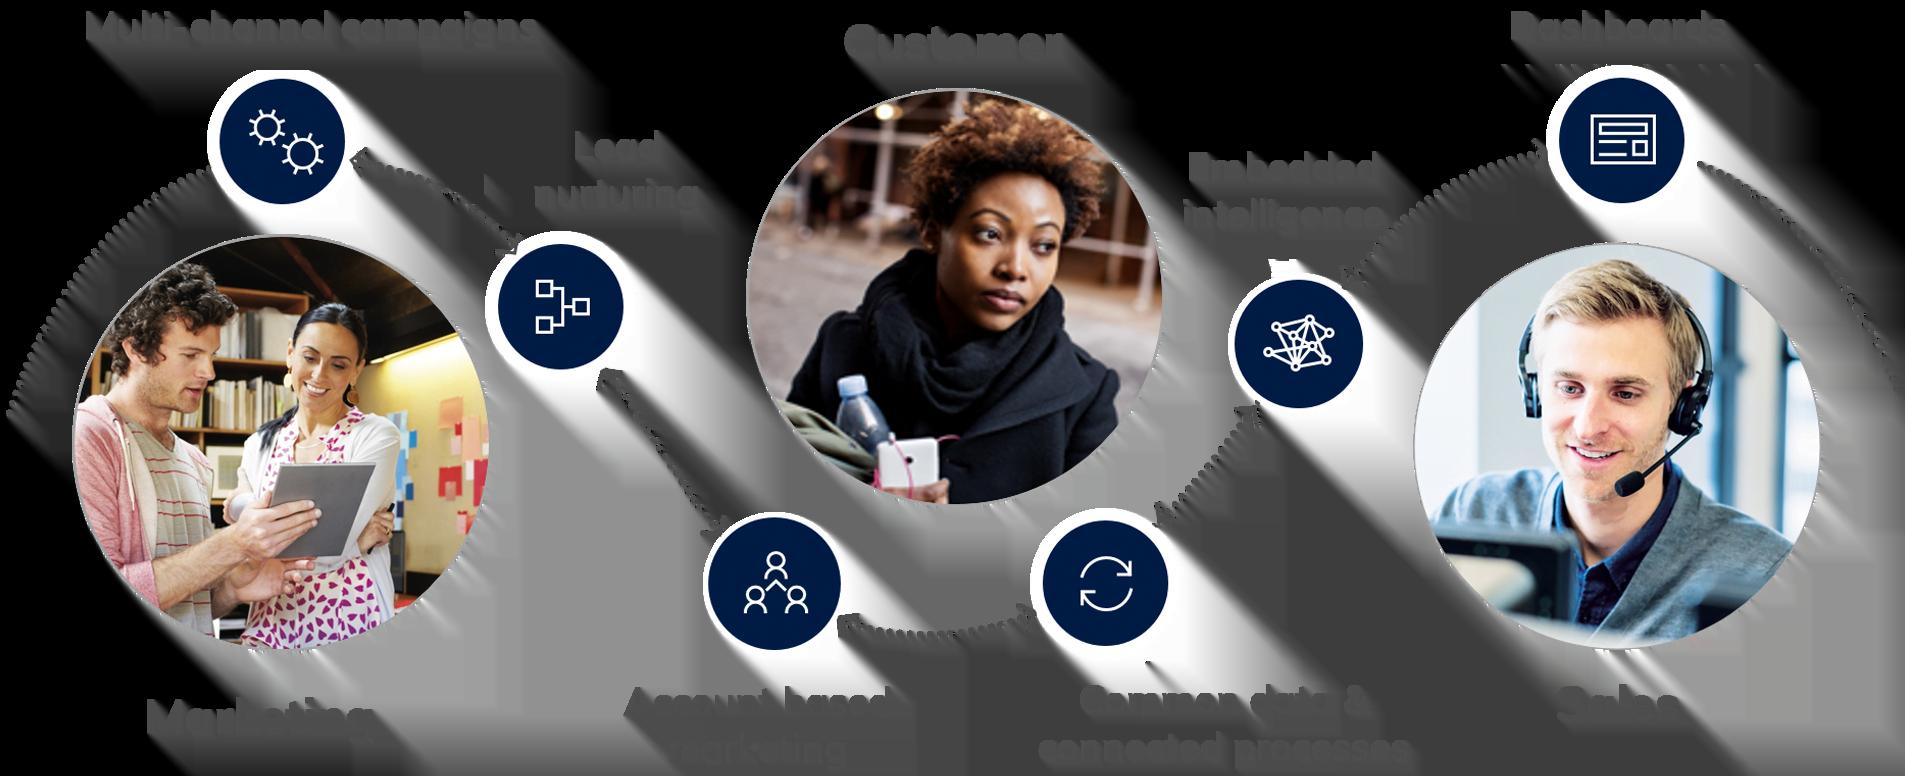 Dynamics 365 Marketing Image